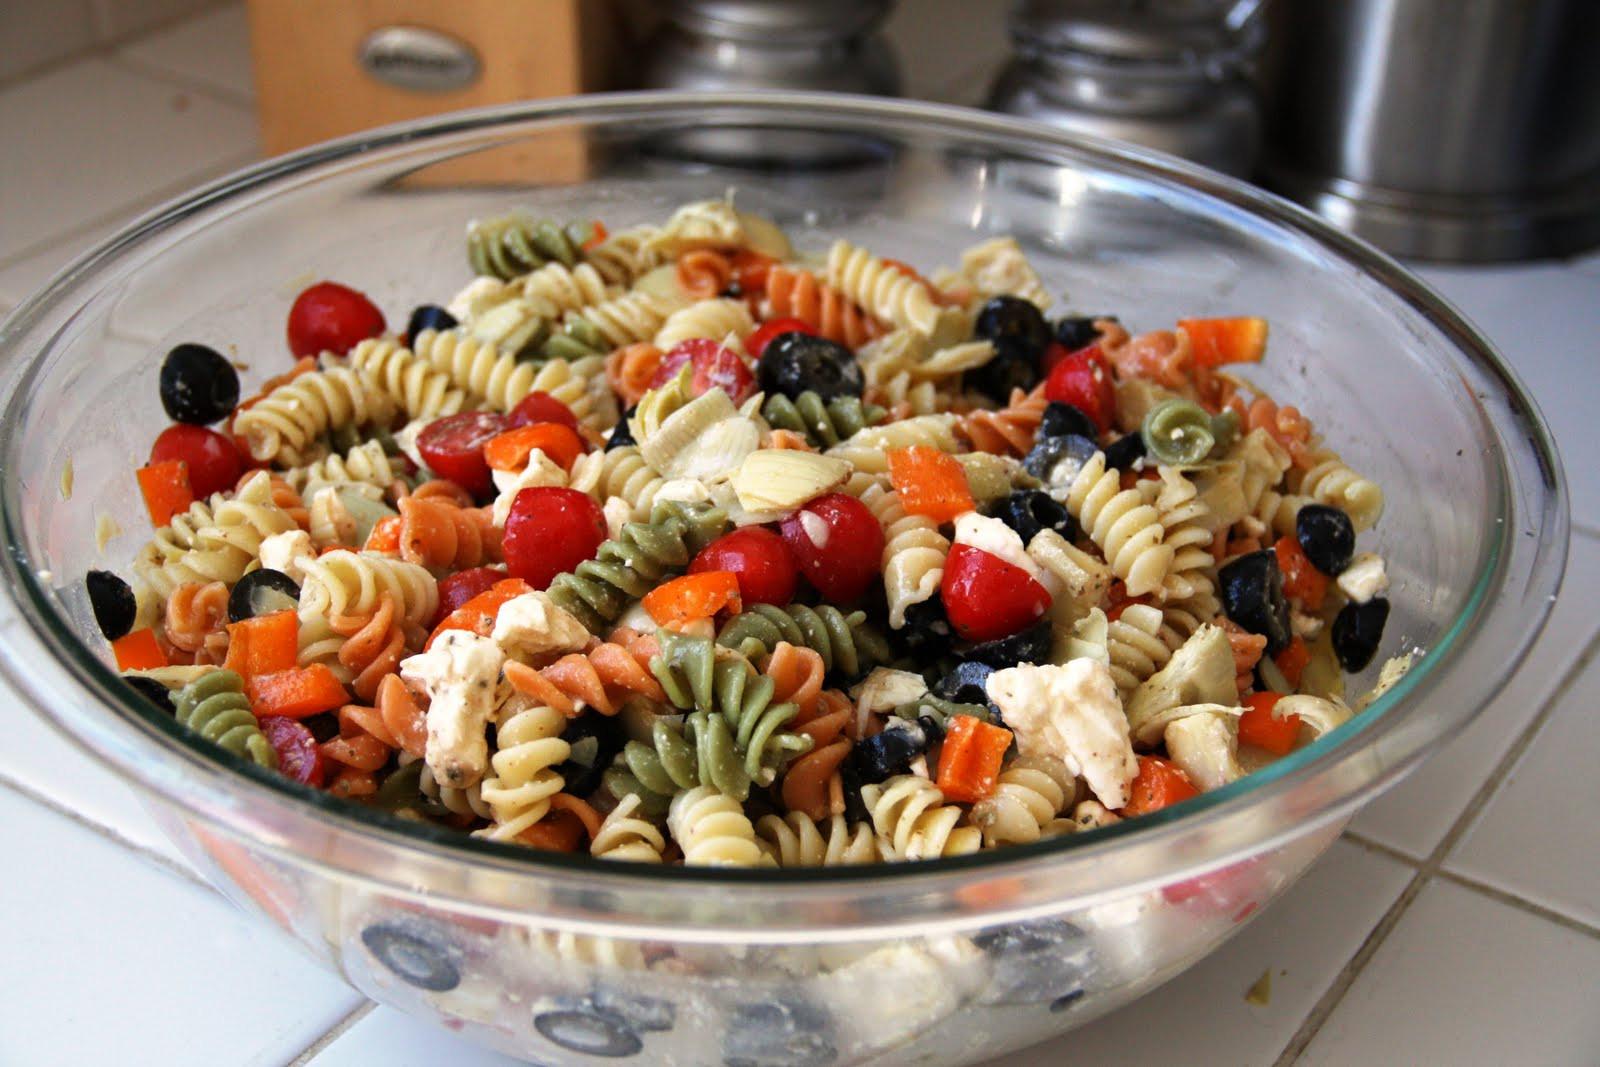 Dairy Free Pasta Salad  Summer Pasta Salad gluten free option vegan option